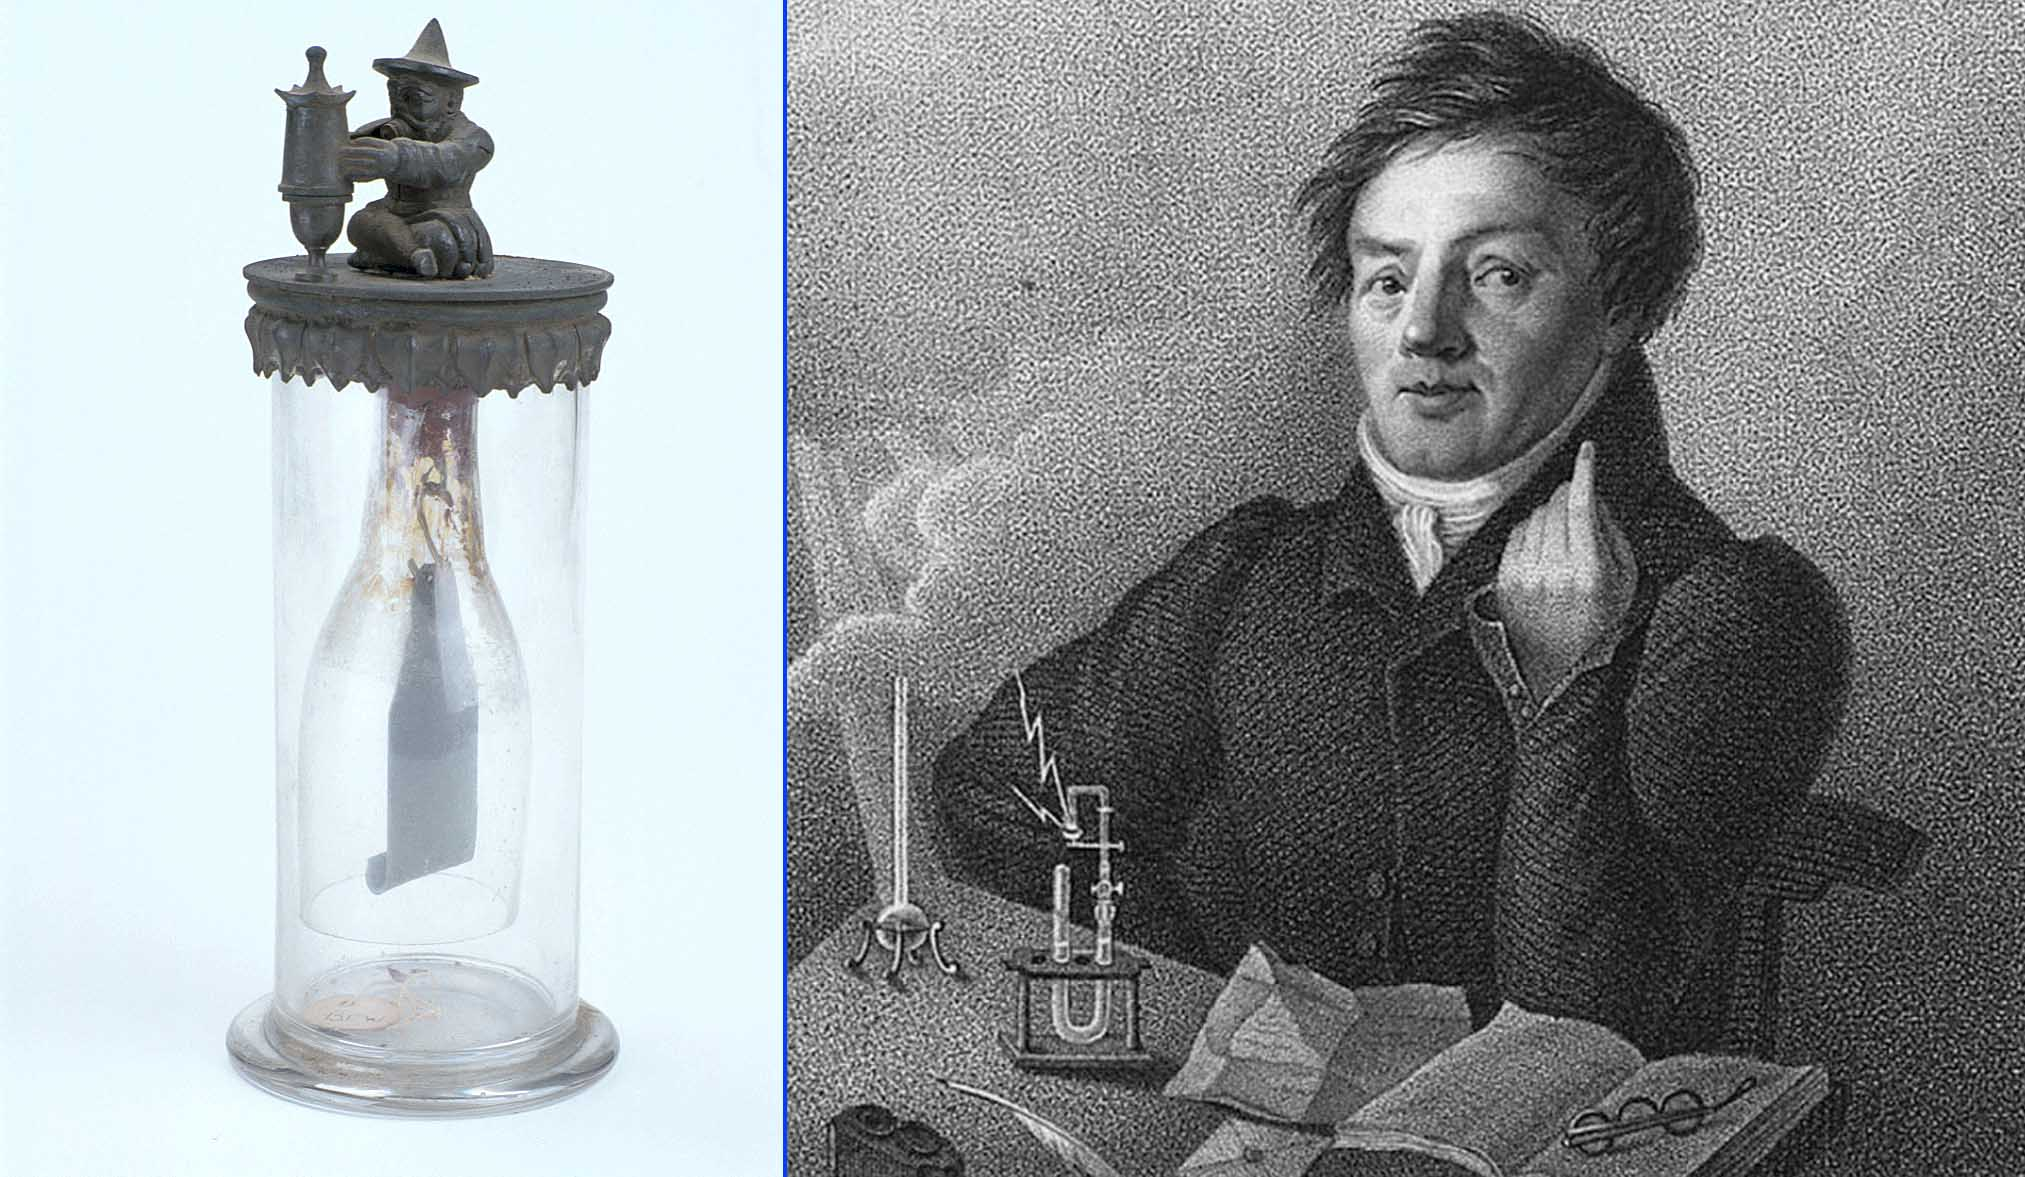 Johann Wolfgang Döbereiner, inventor de la lámpara de Döbereiner, un proto-mechero